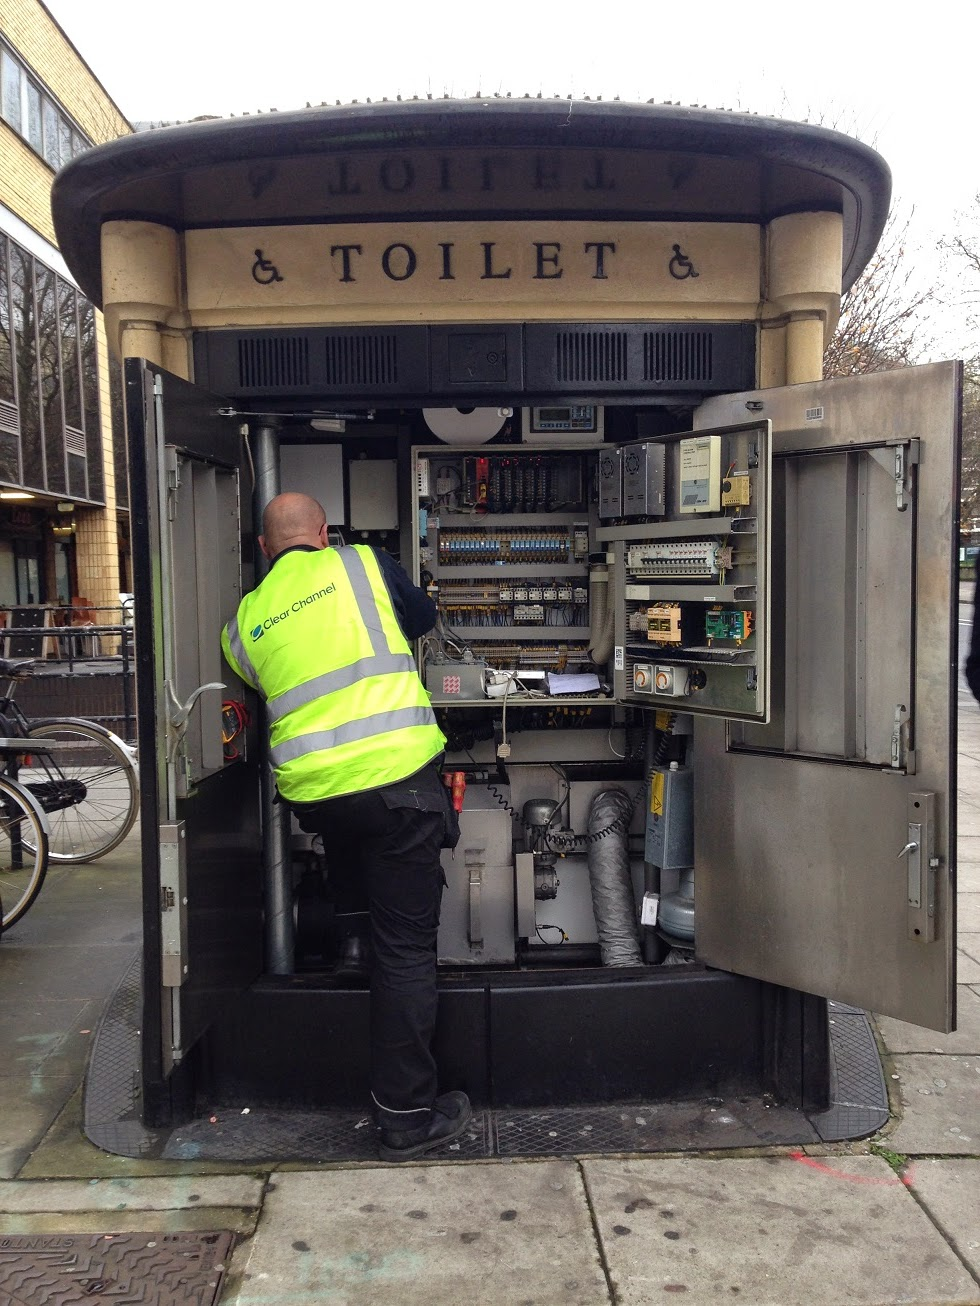 Toilet-cum-telephone exchange, Bishop's Bridge Road, London W2